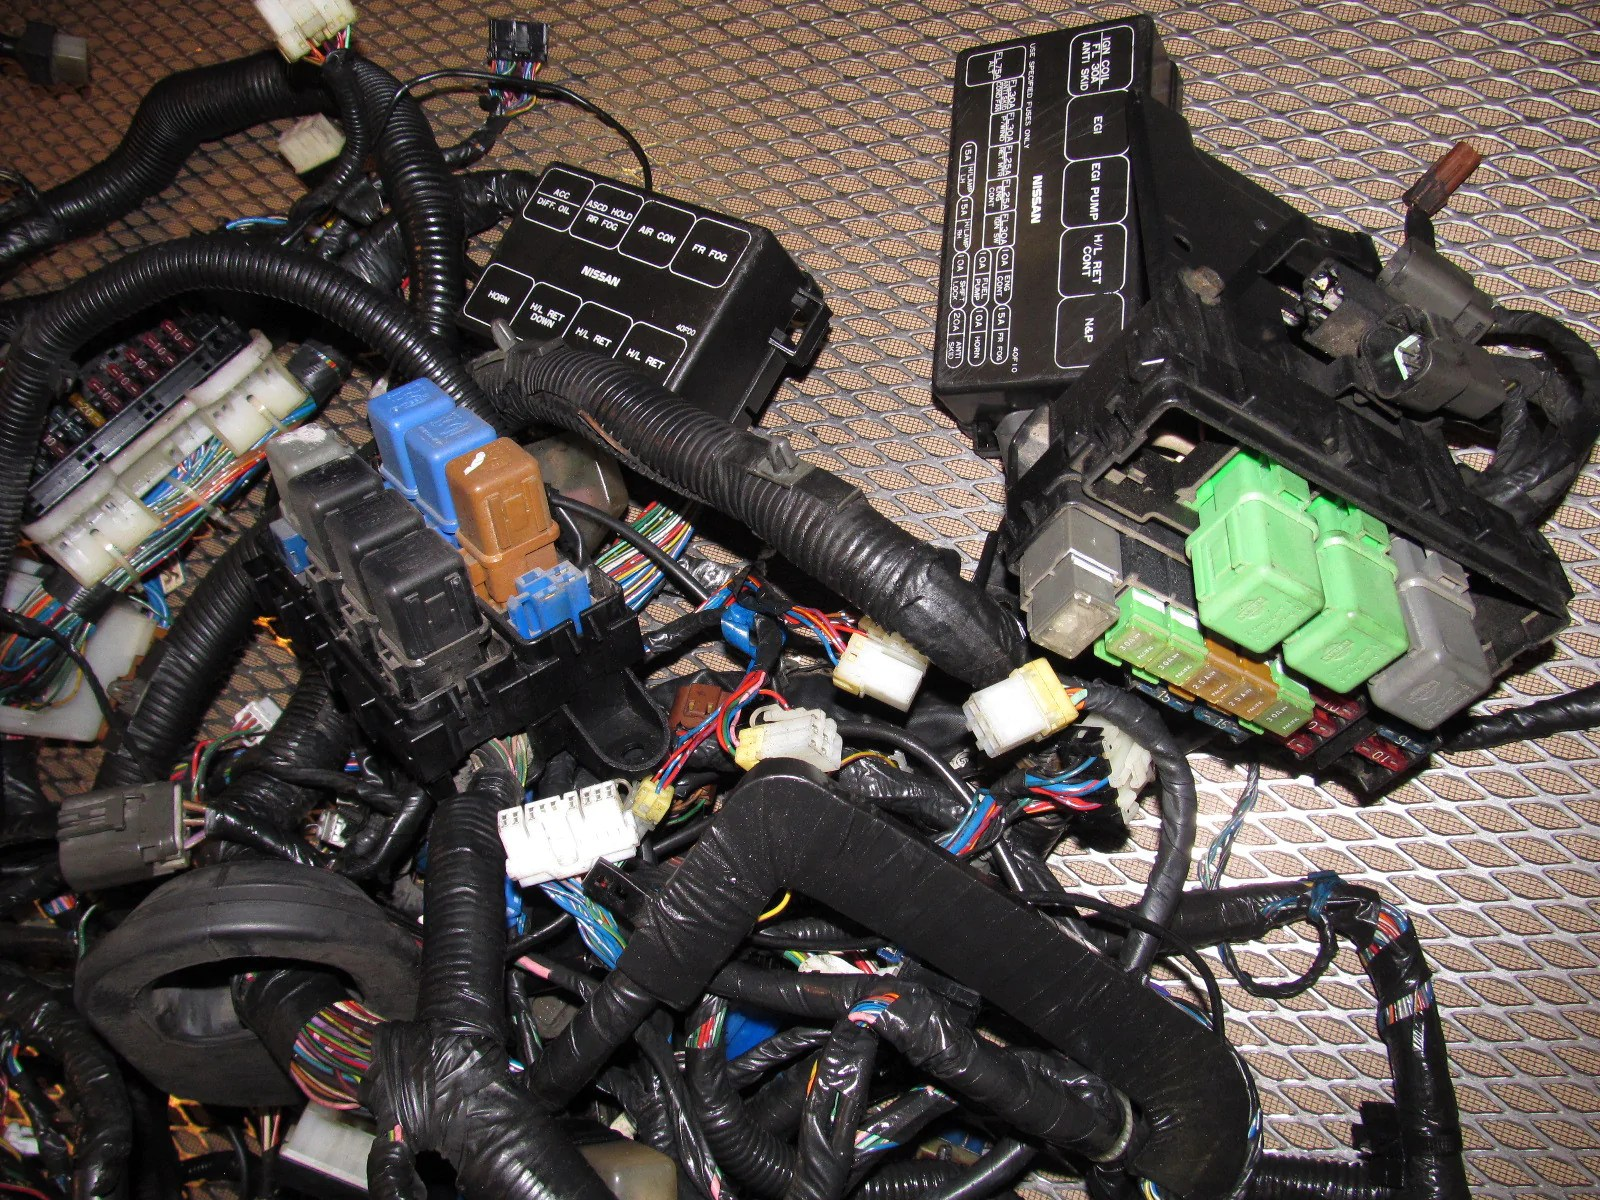 89 240sx fuse box wiring diagram [ 1600 x 1200 Pixel ]